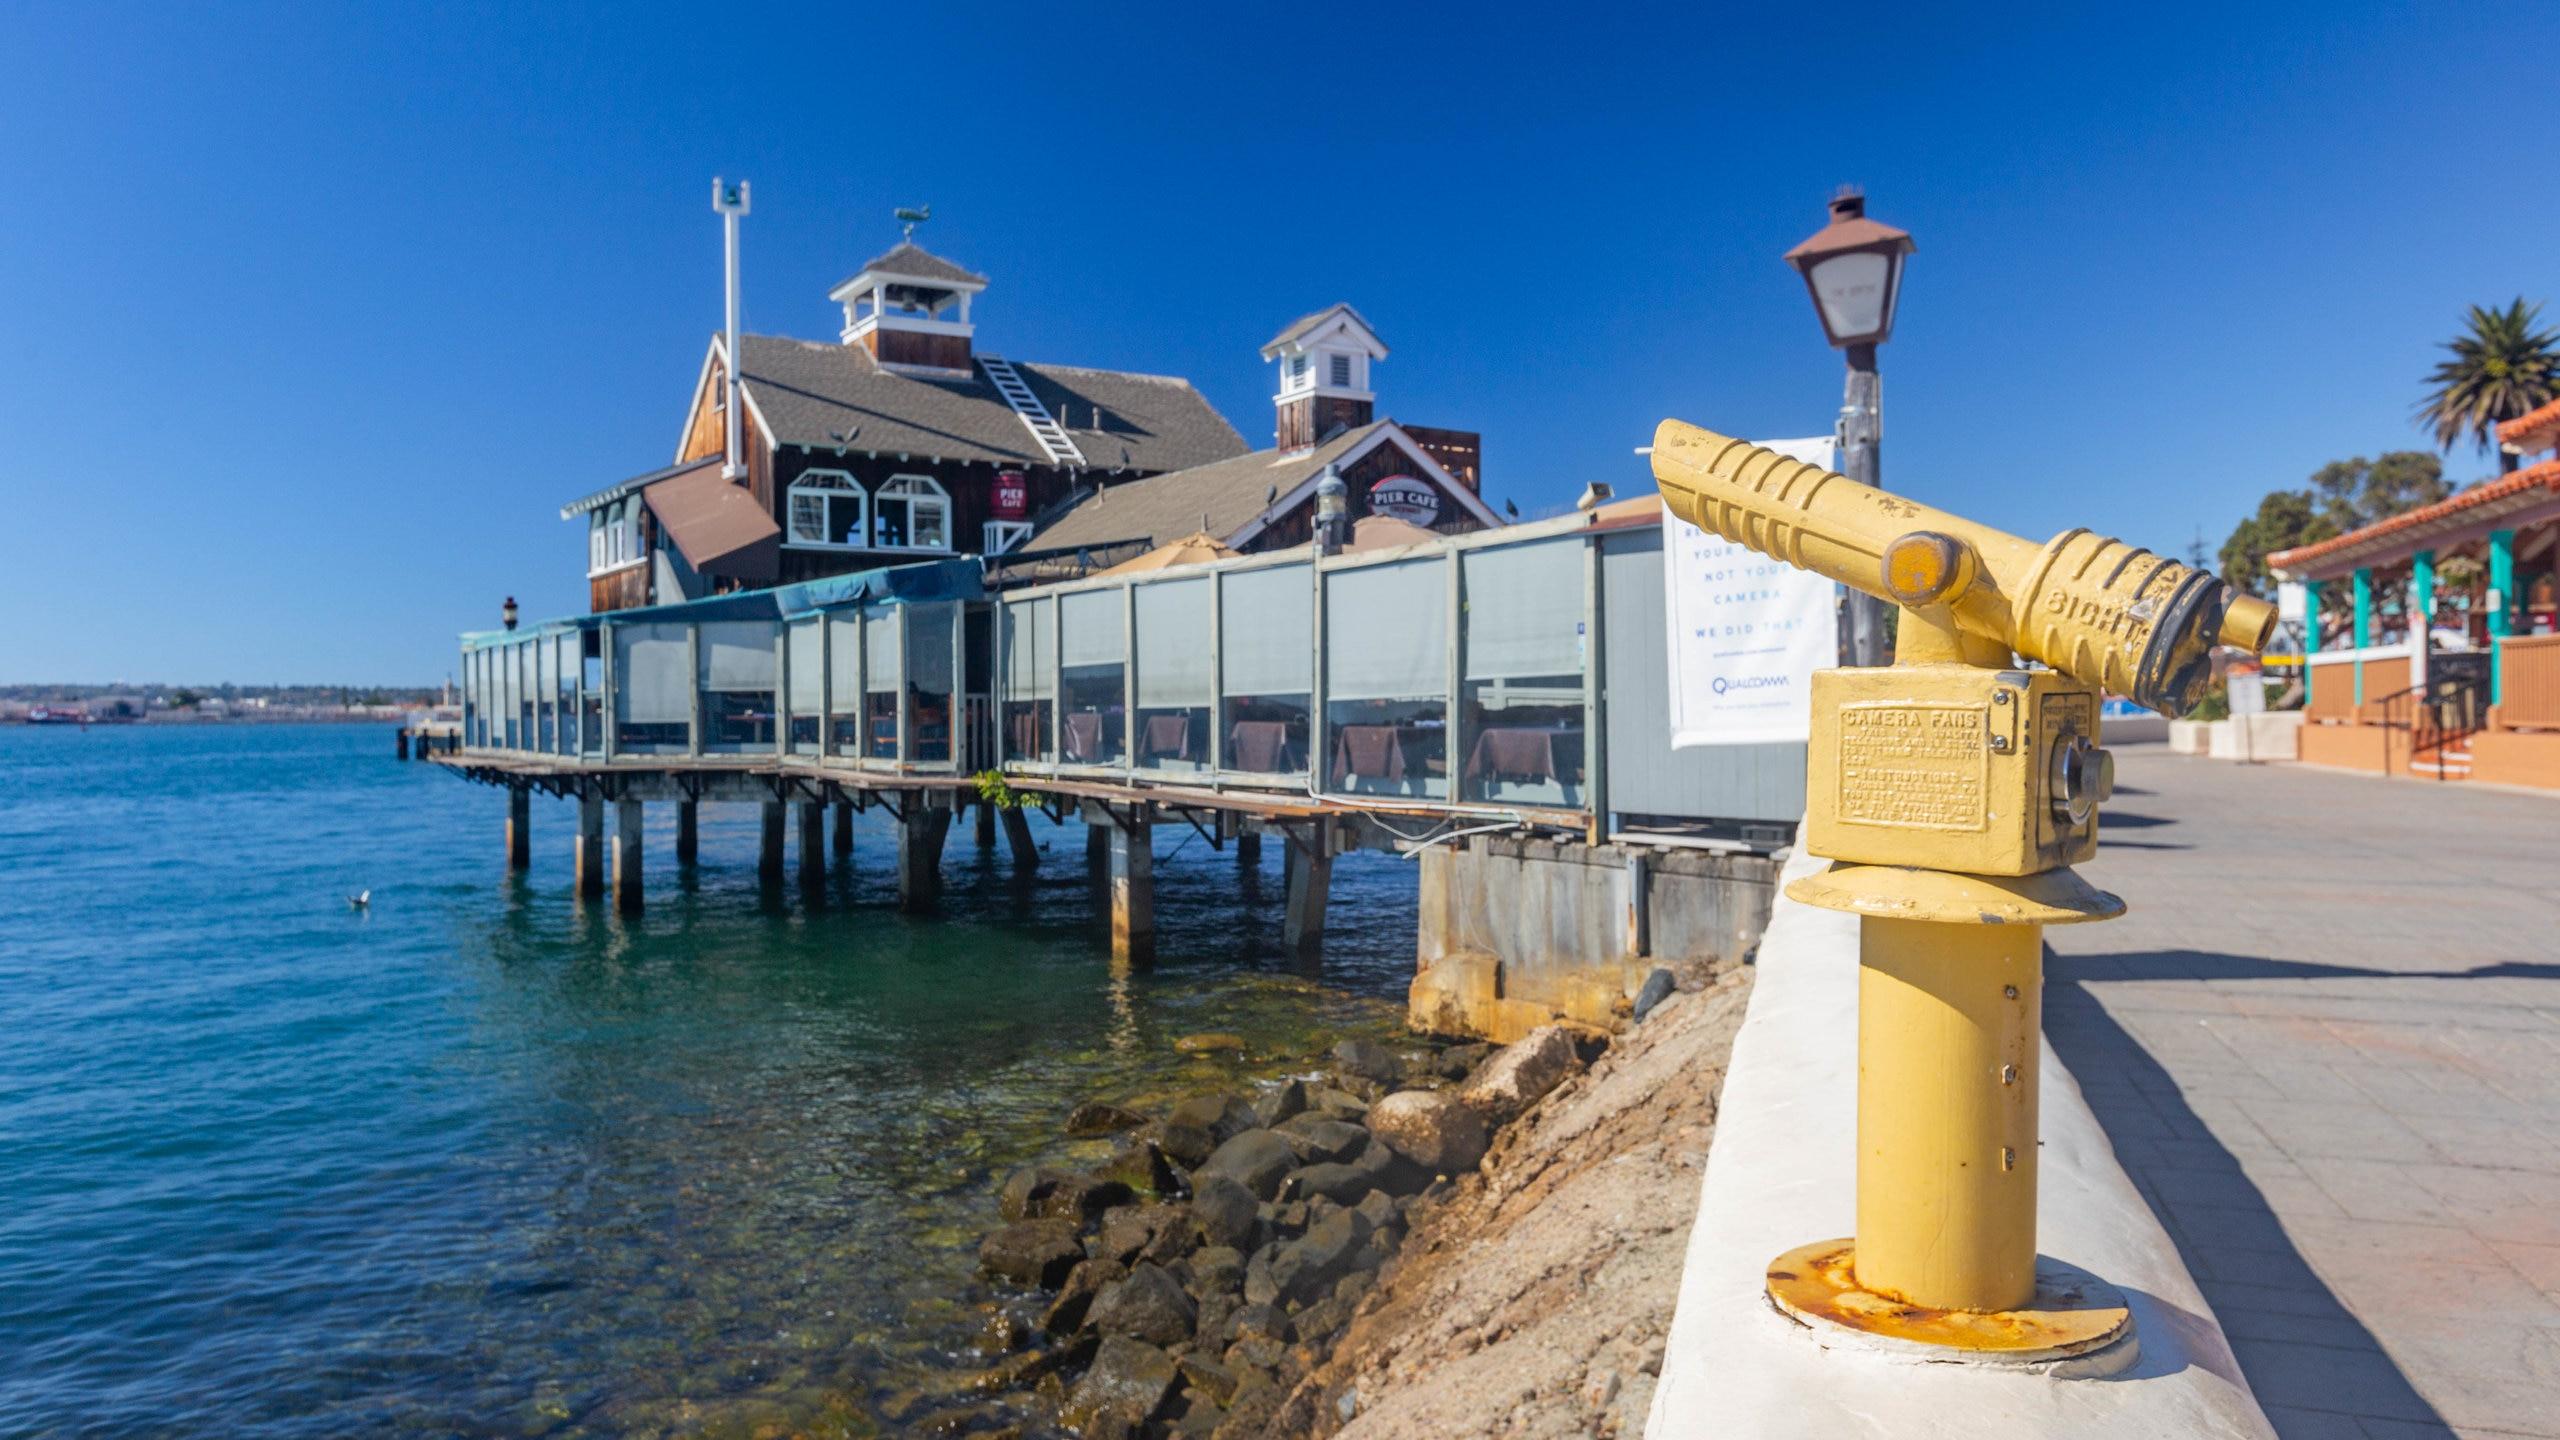 Seaport Village, San Diego, California, United States of America